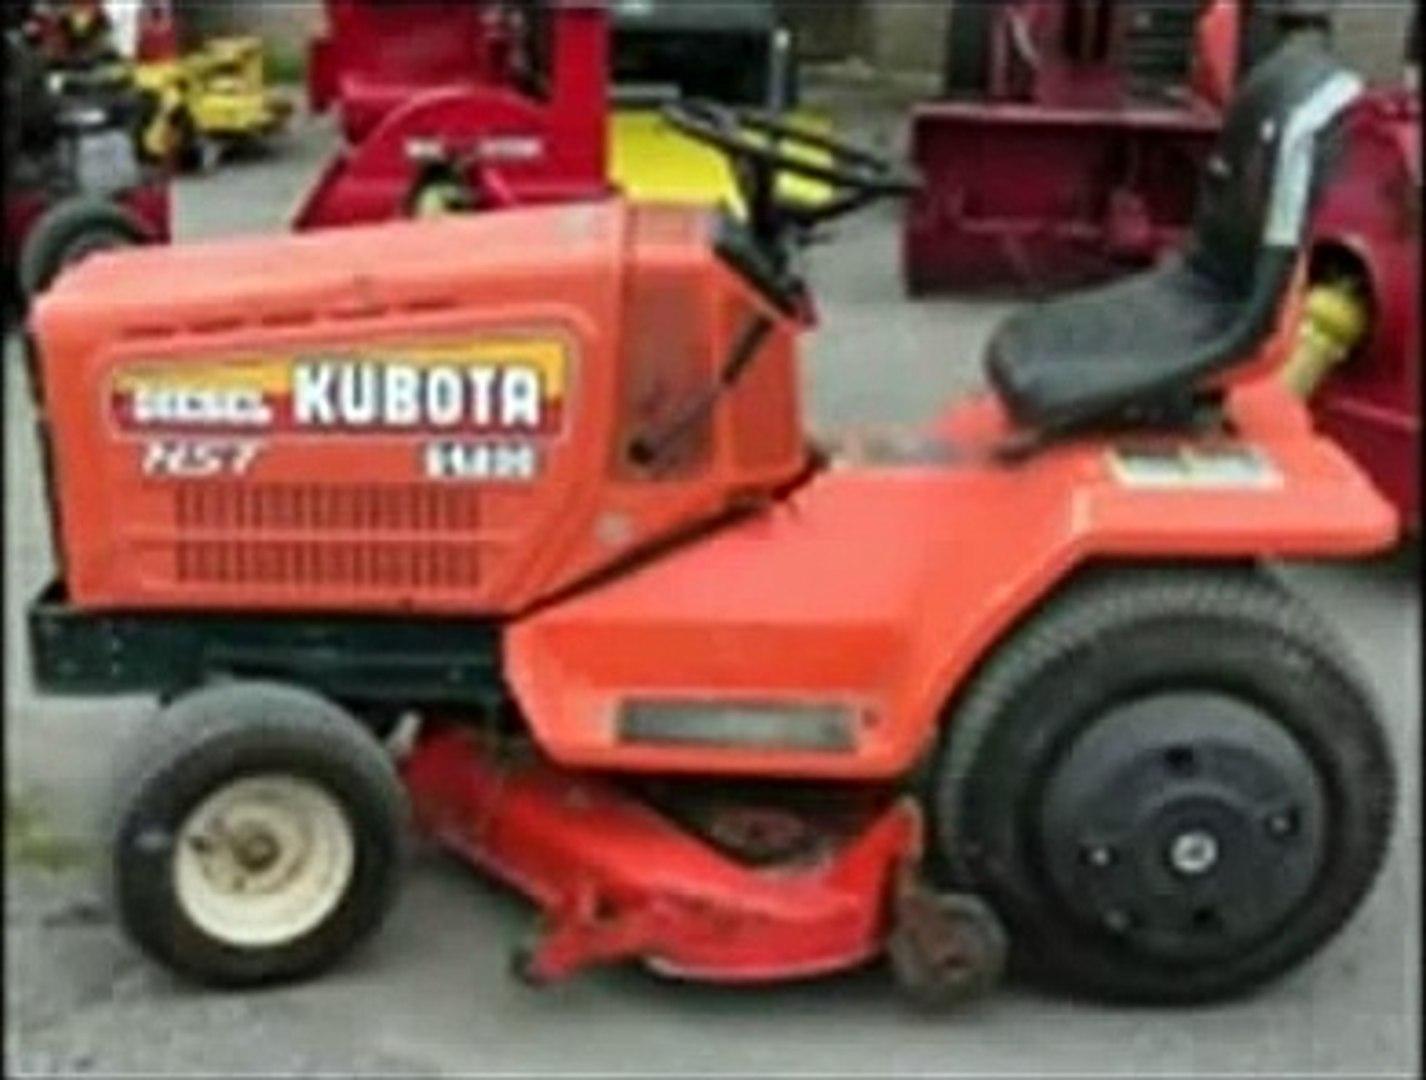 Kubota G3200 G4200 G4200H G5200H G6200H Lawn Garden Tractor Operator on